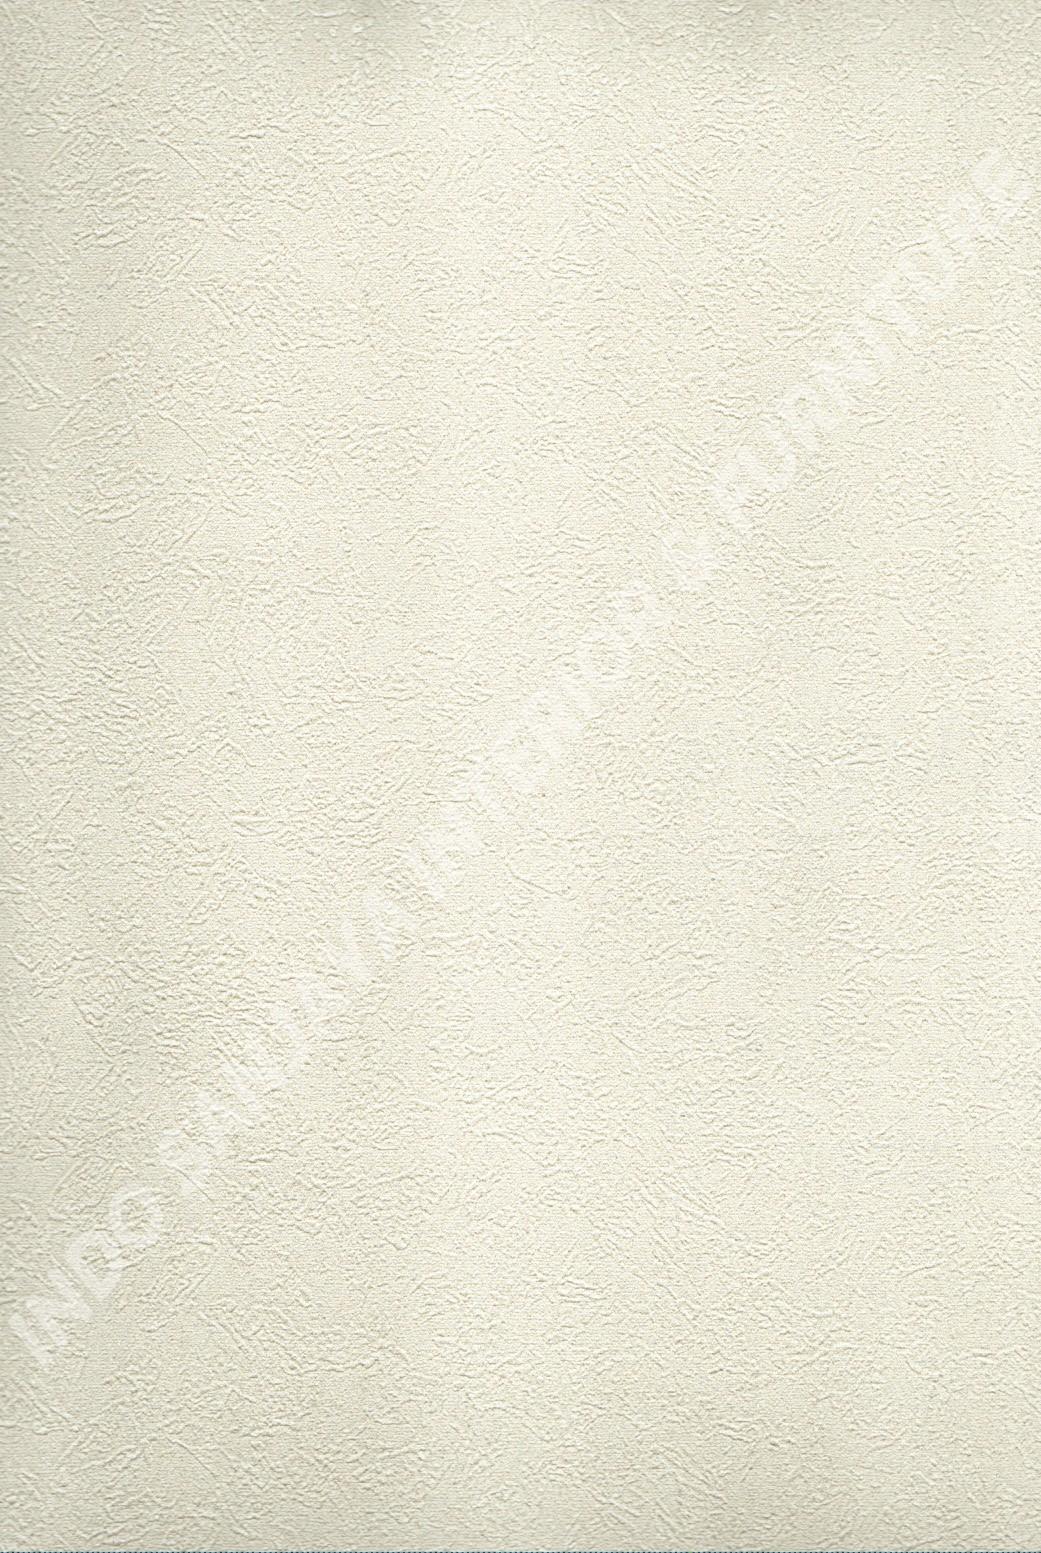 wallpaper   Wallpaper Minimalis Polos 11092:11092 corak  warna